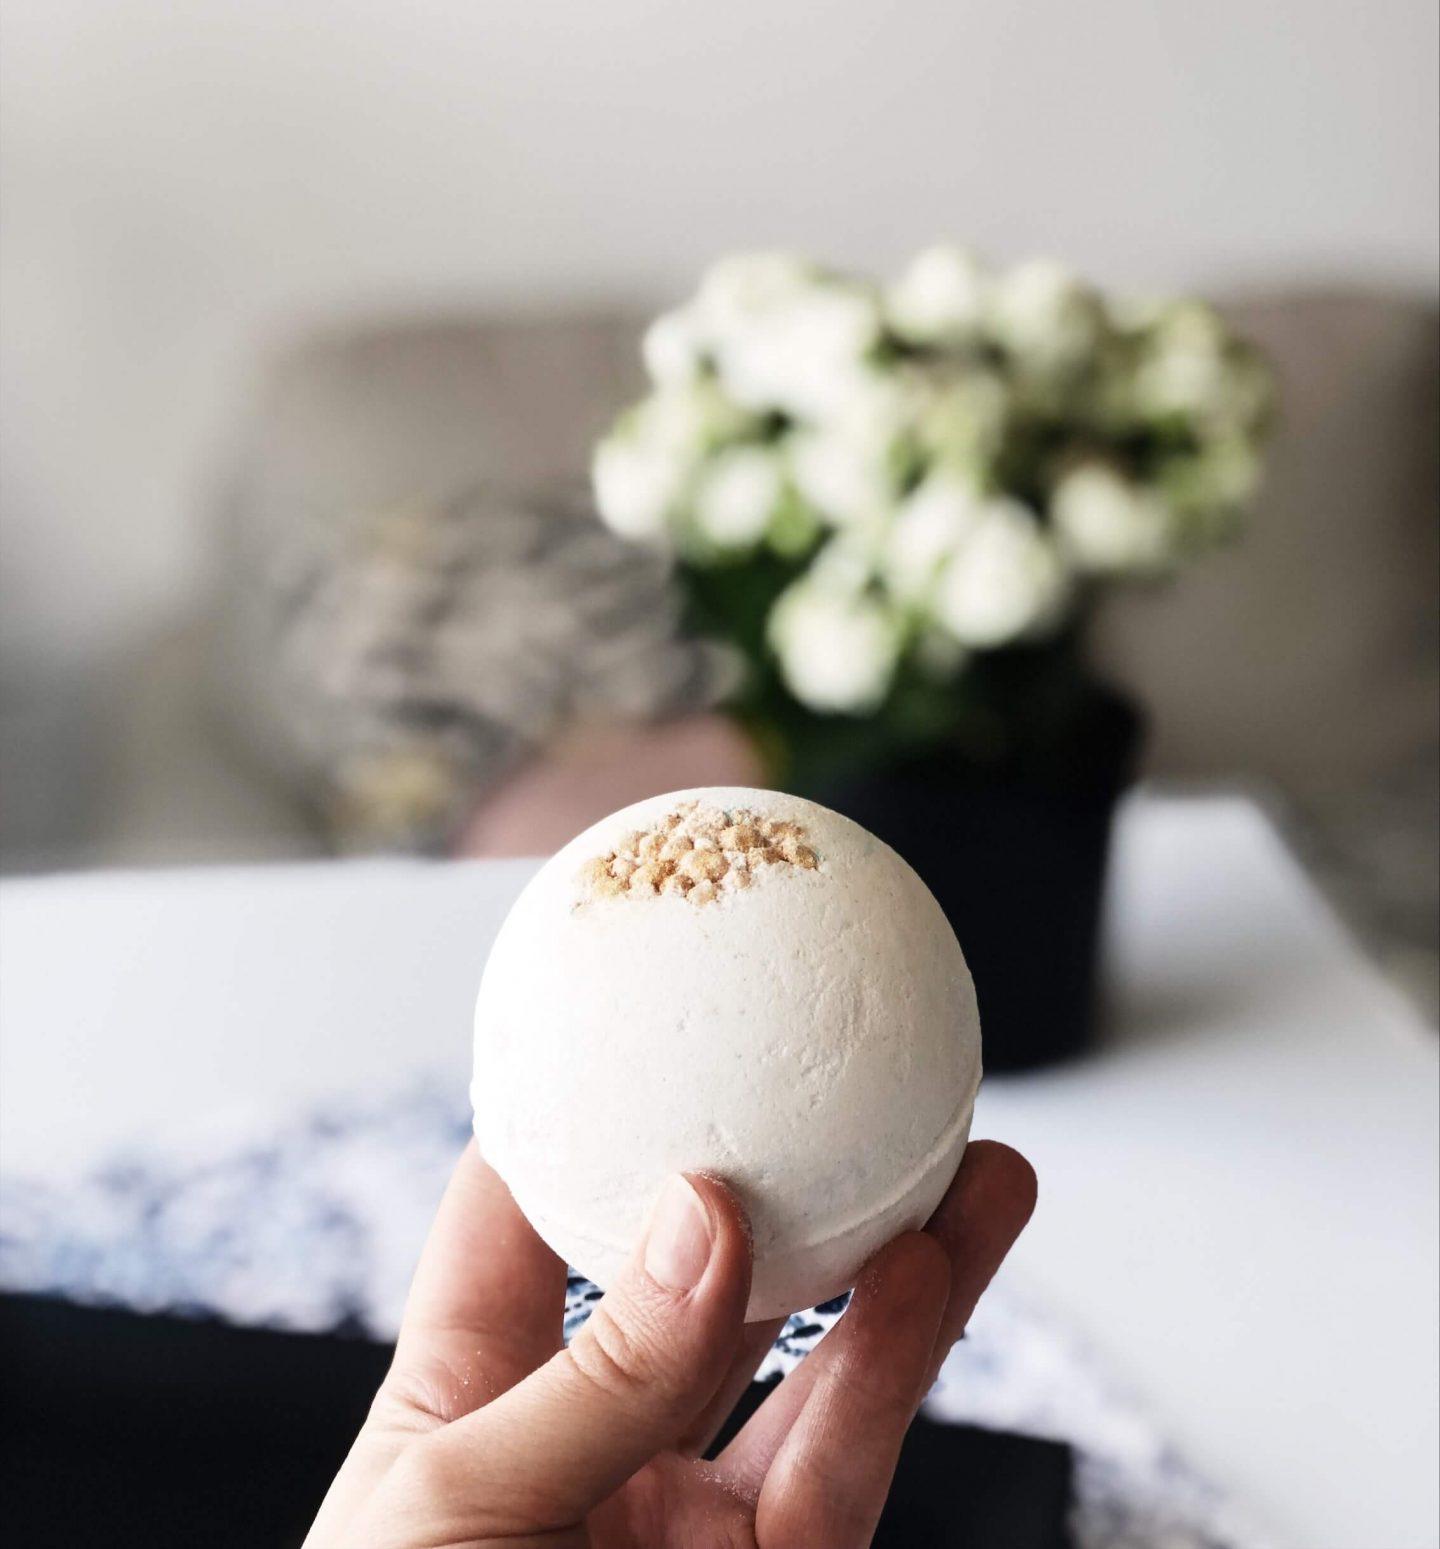 Lush bath bomb perle de sel topknotch